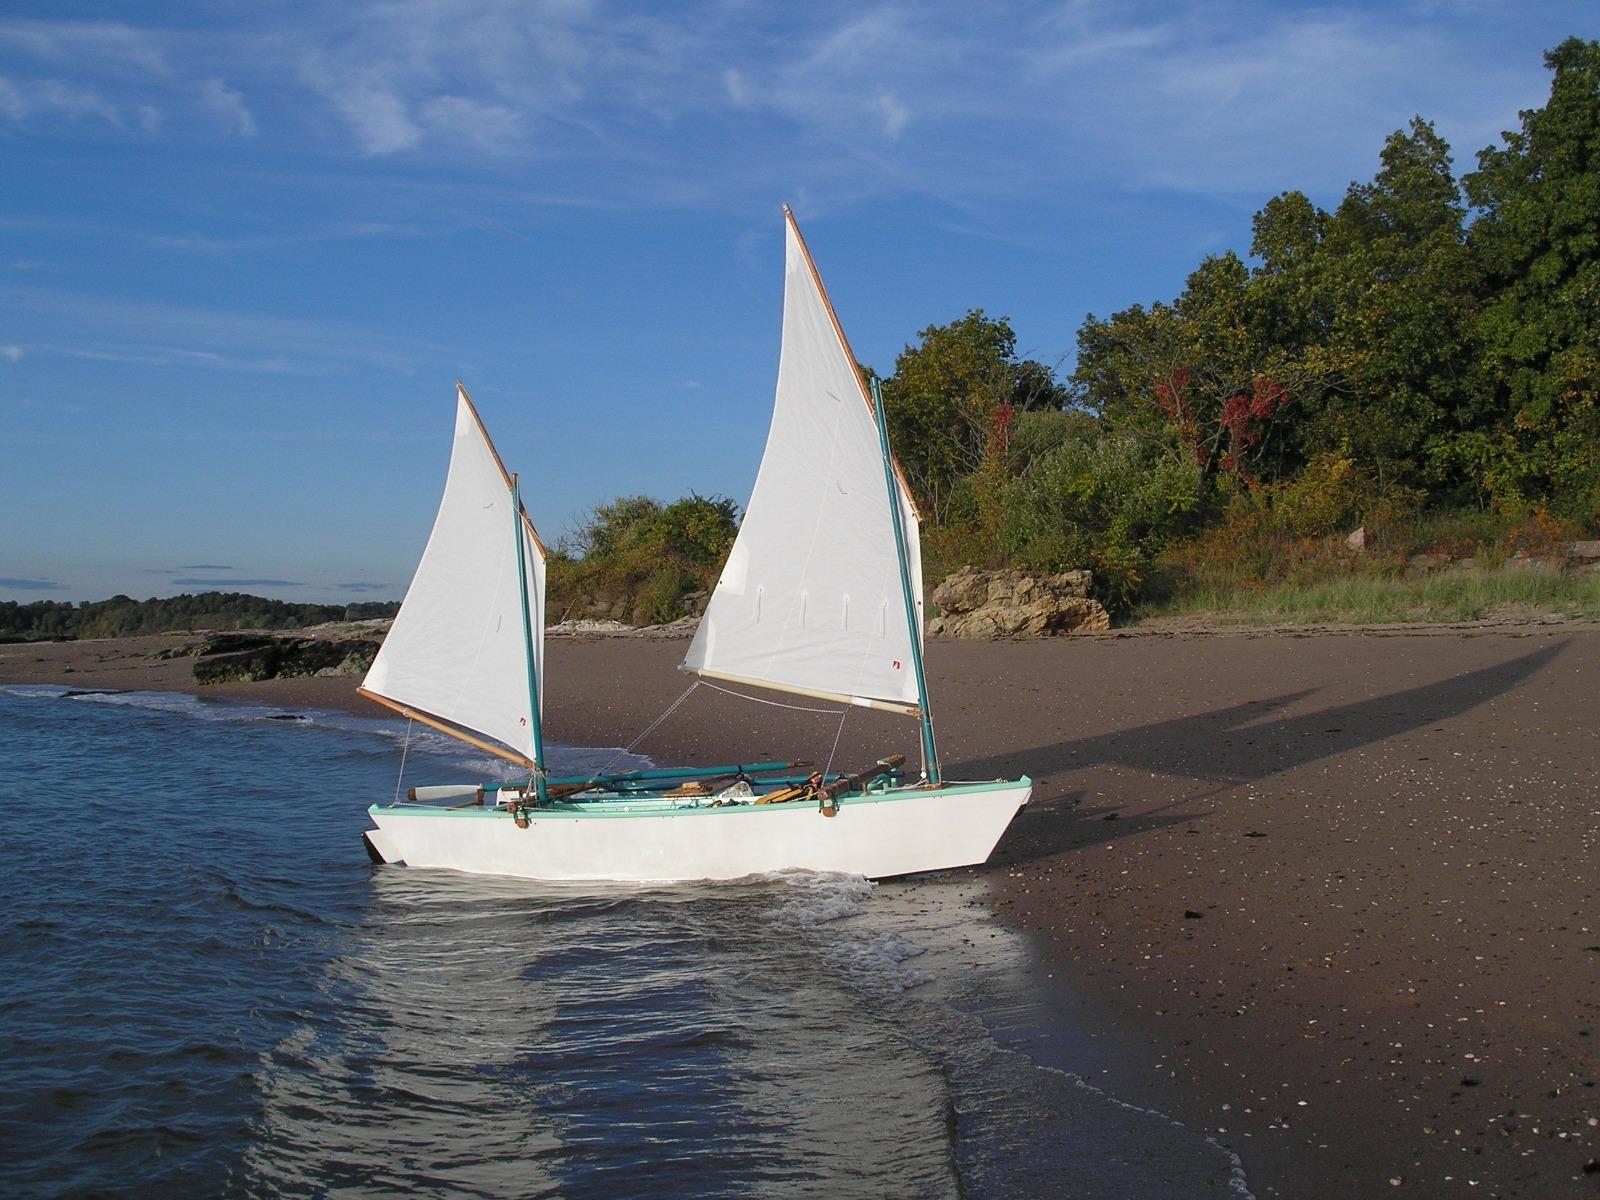 16 Foot Fibreglass 2 Person Canoe